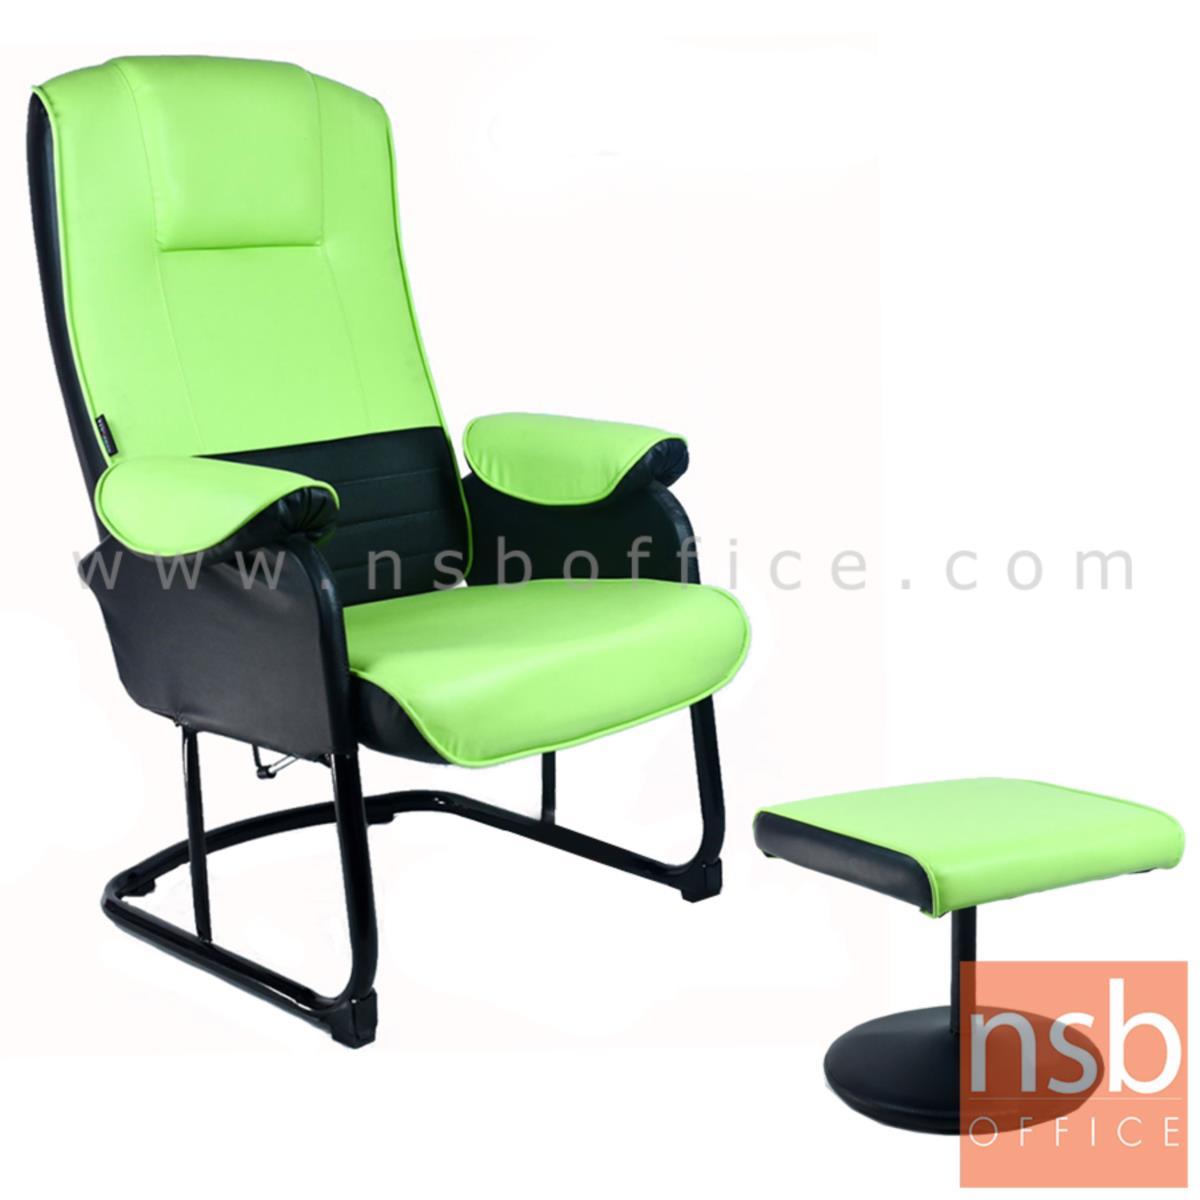 B15A044:เก้าอี้พักผ่อน รุ่น Bougaville (บูเกฟวิลล)  ขาเหล็กพ่นดำ